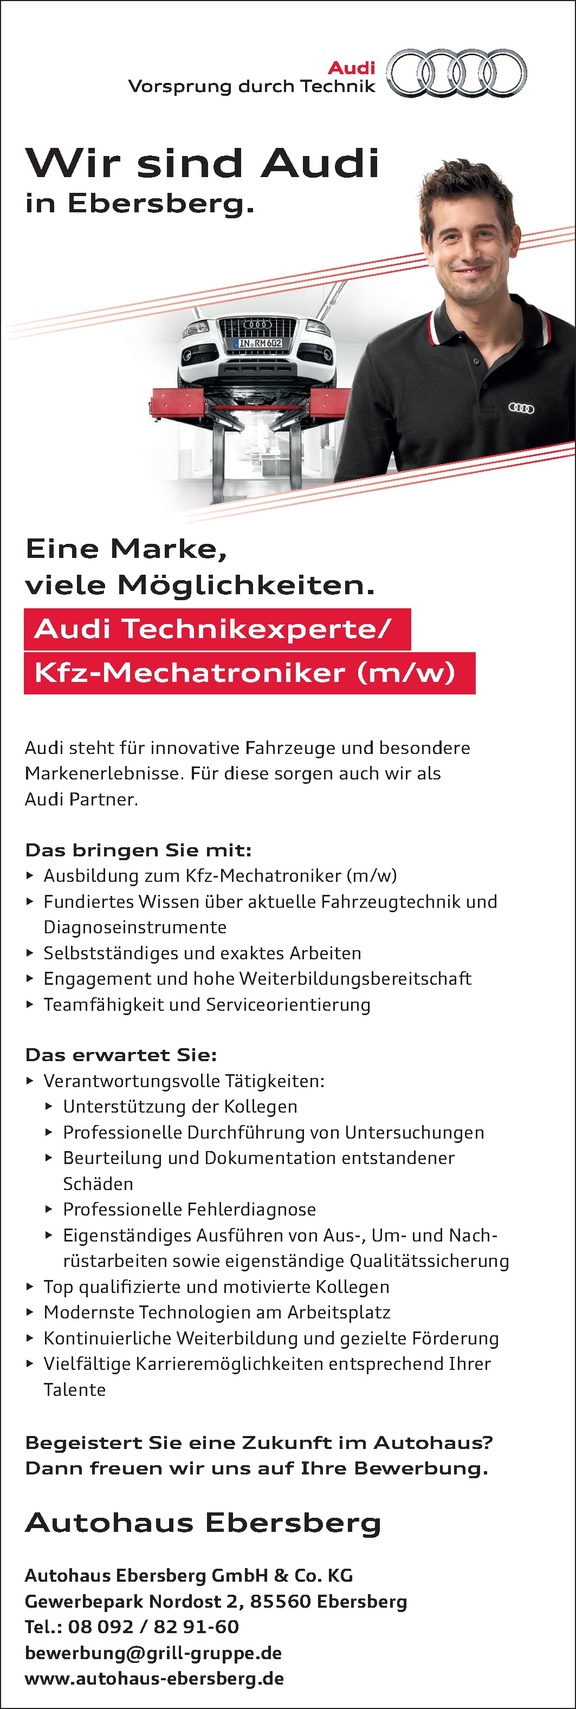 Kfz-Mechaniker / Mechatroniker / Audi Technikexperte (m/w)